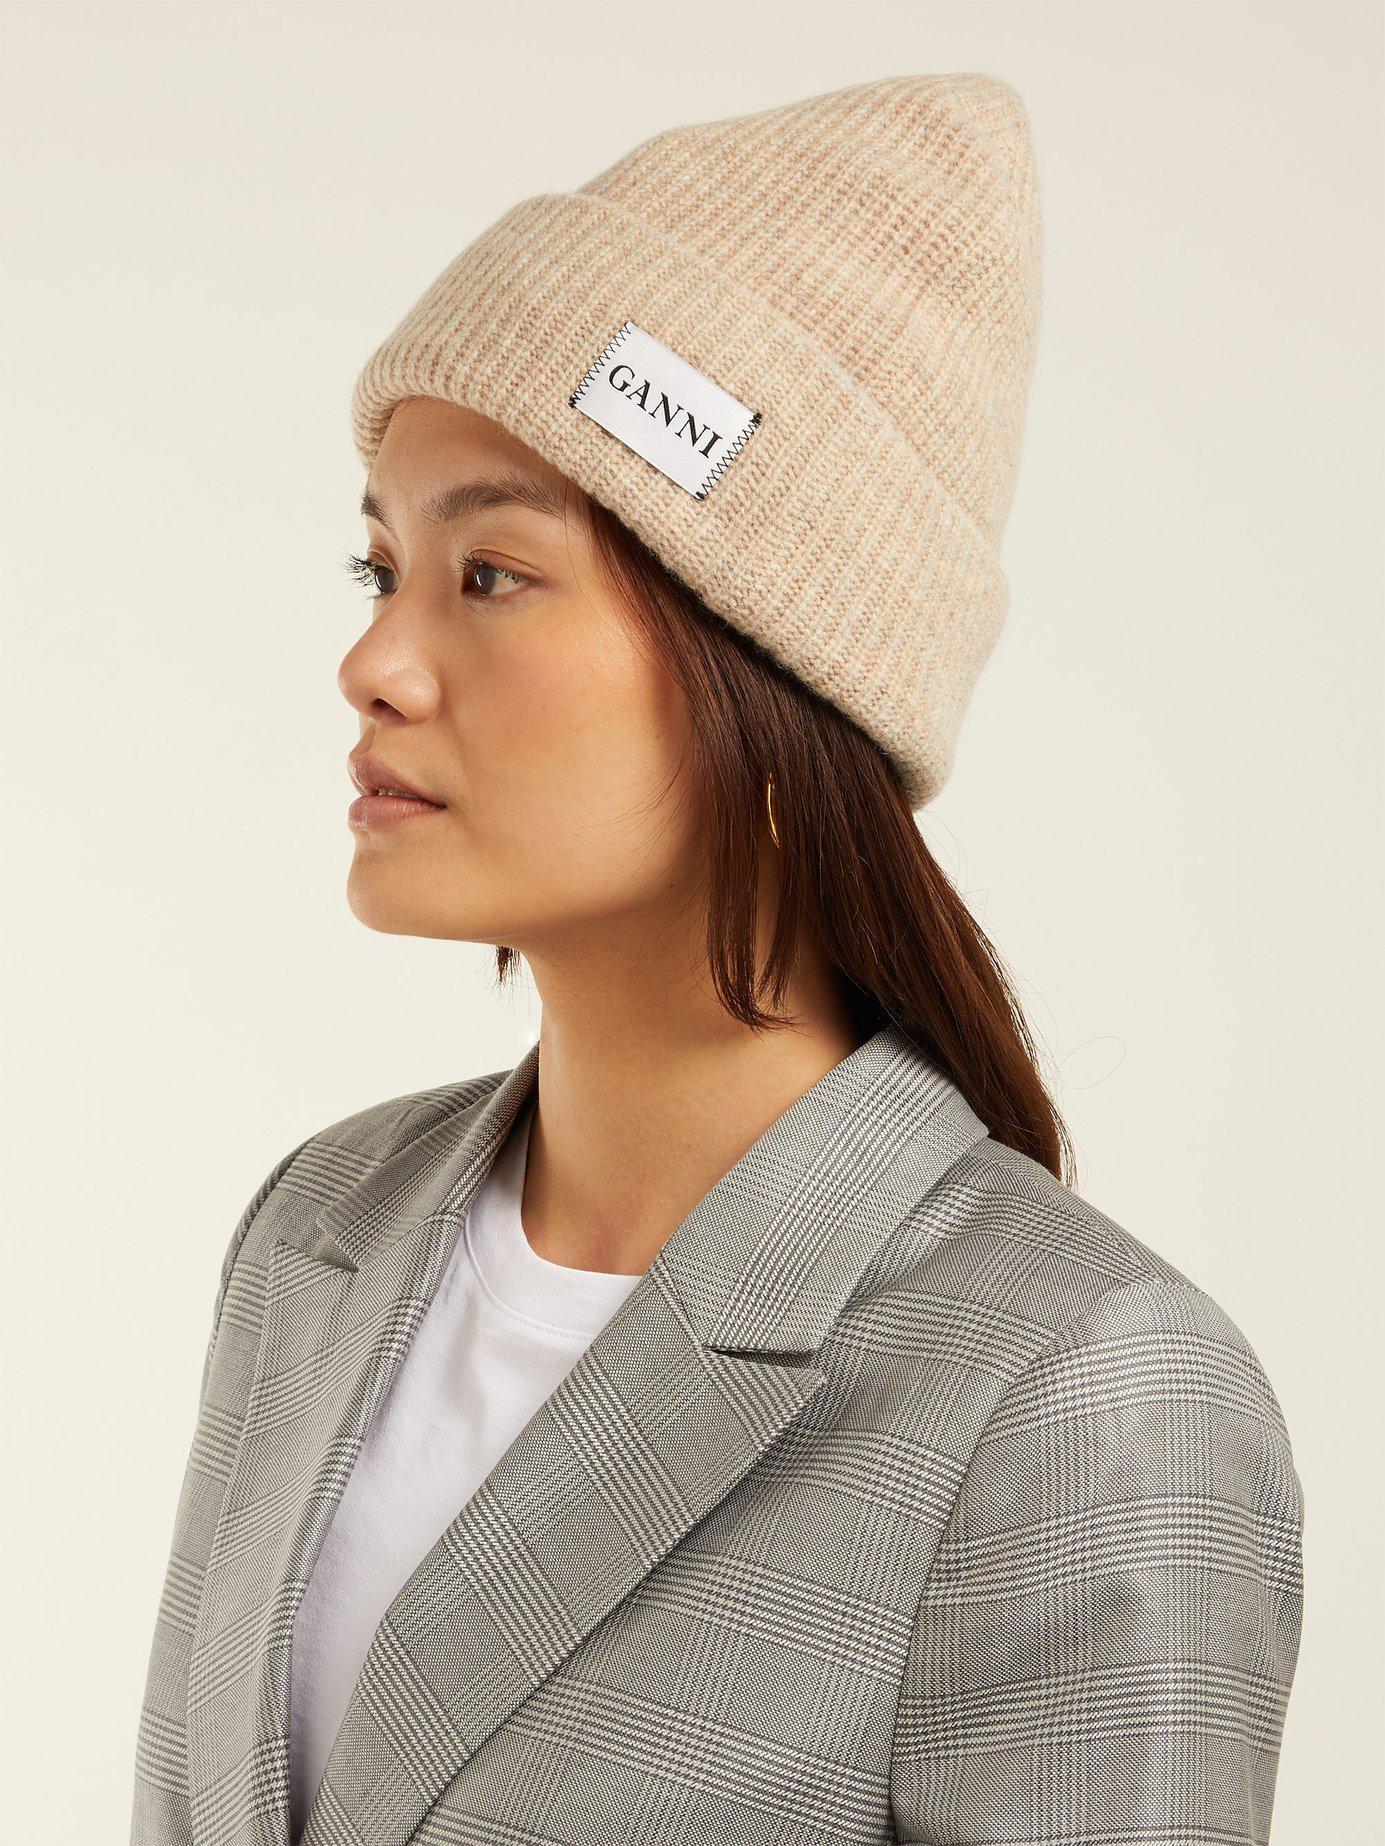 Lyst - Ganni Hatley Wool Blend Beanie Hat in Natural d9a9e0ff546